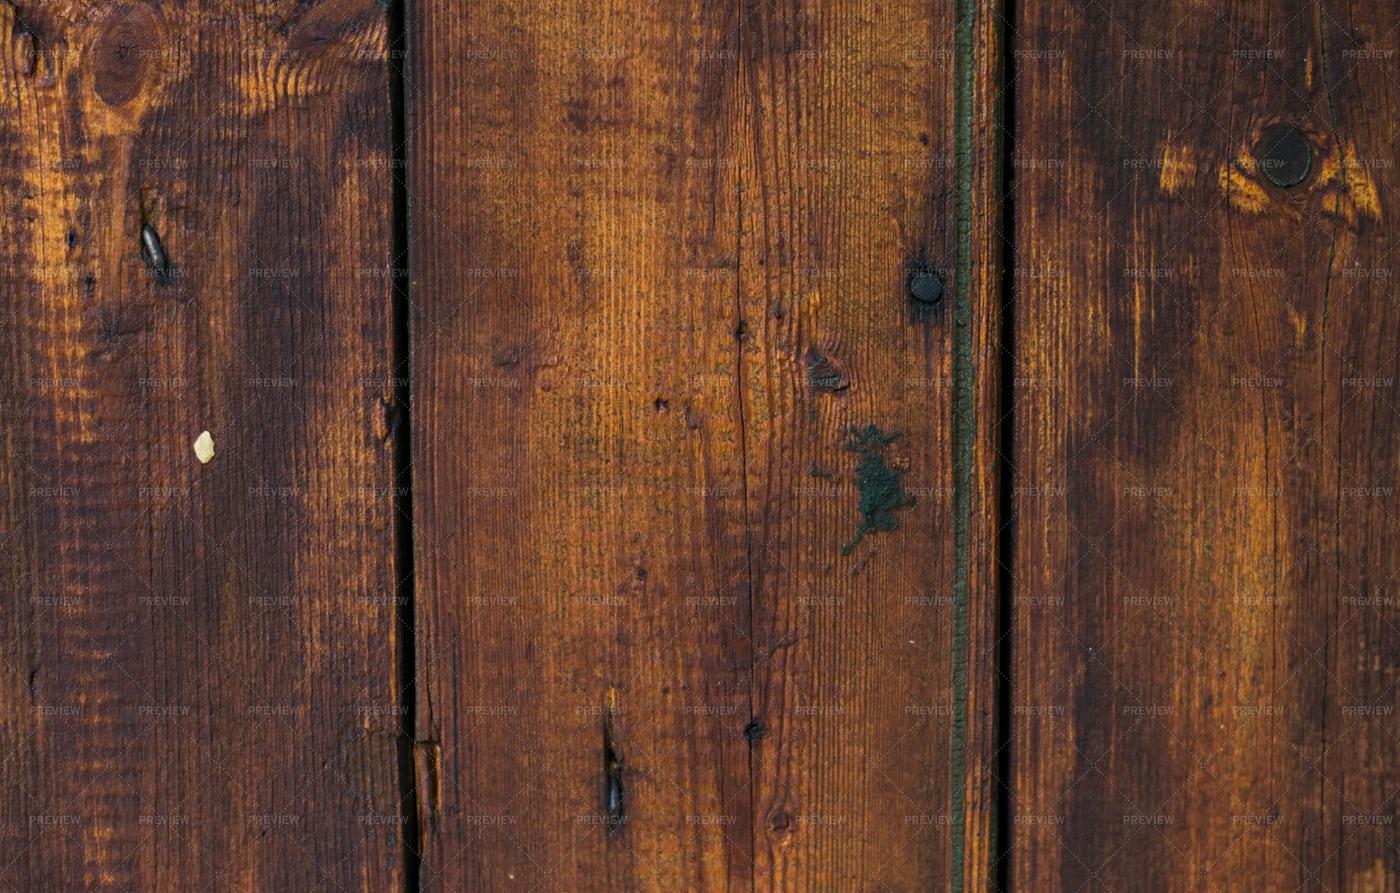 Dark Wooden Texture: Stock Photos